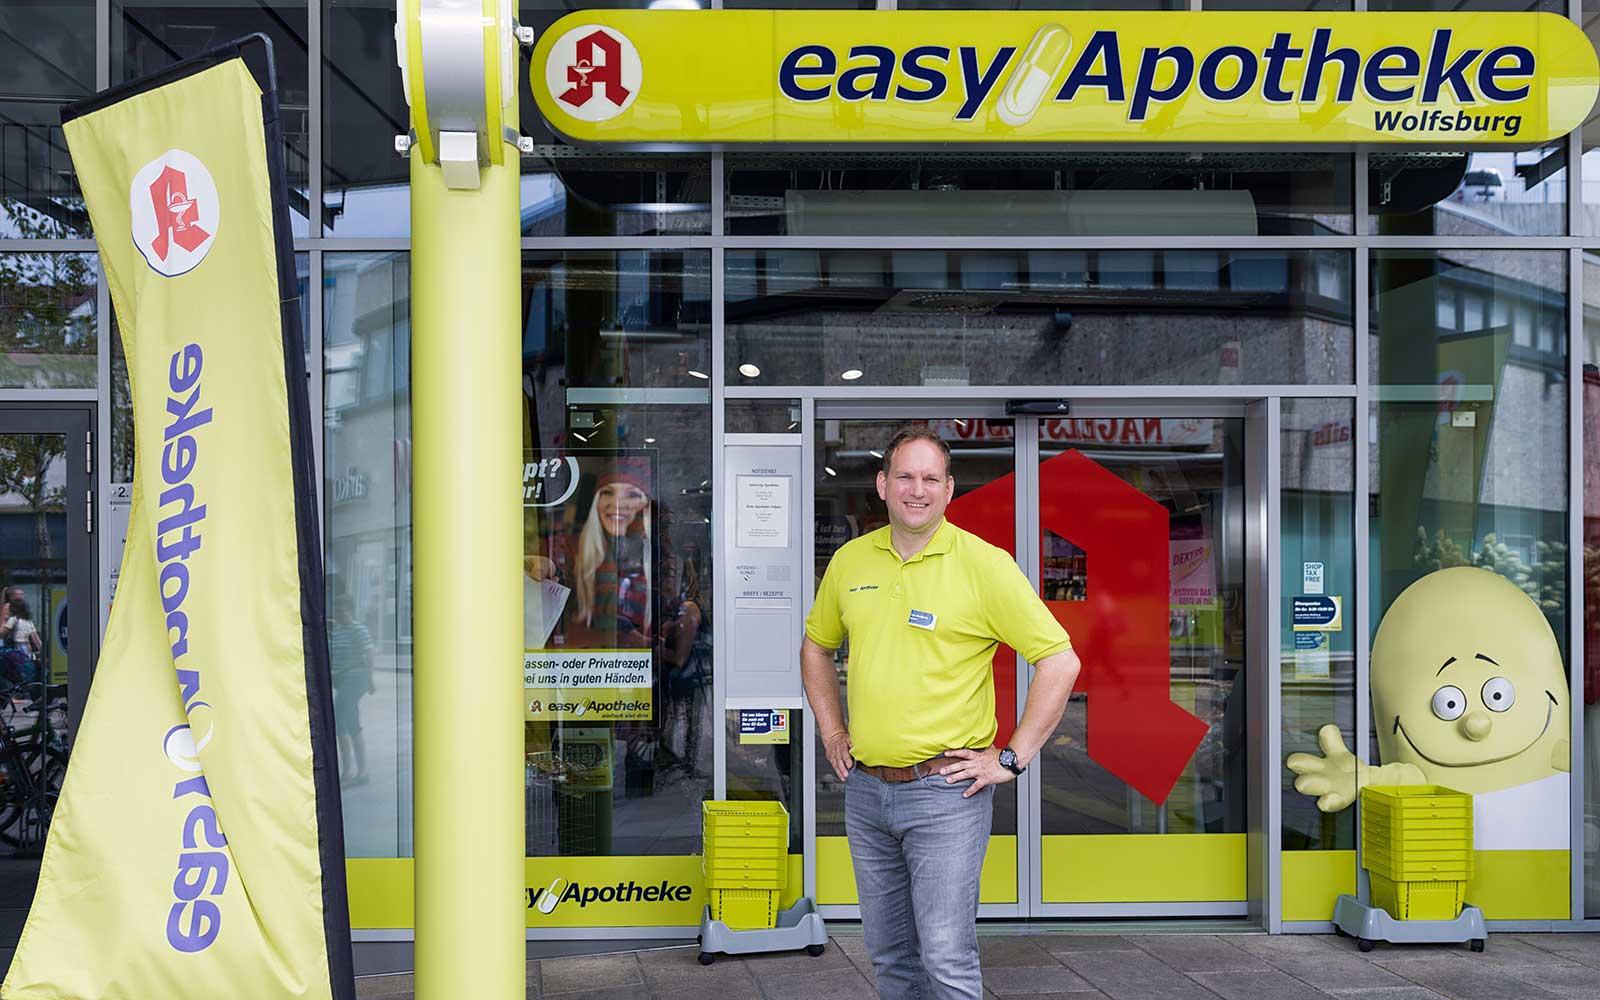 Apotheker Lars Haselhorst vor seiner easyApotheke in Wolfsburg